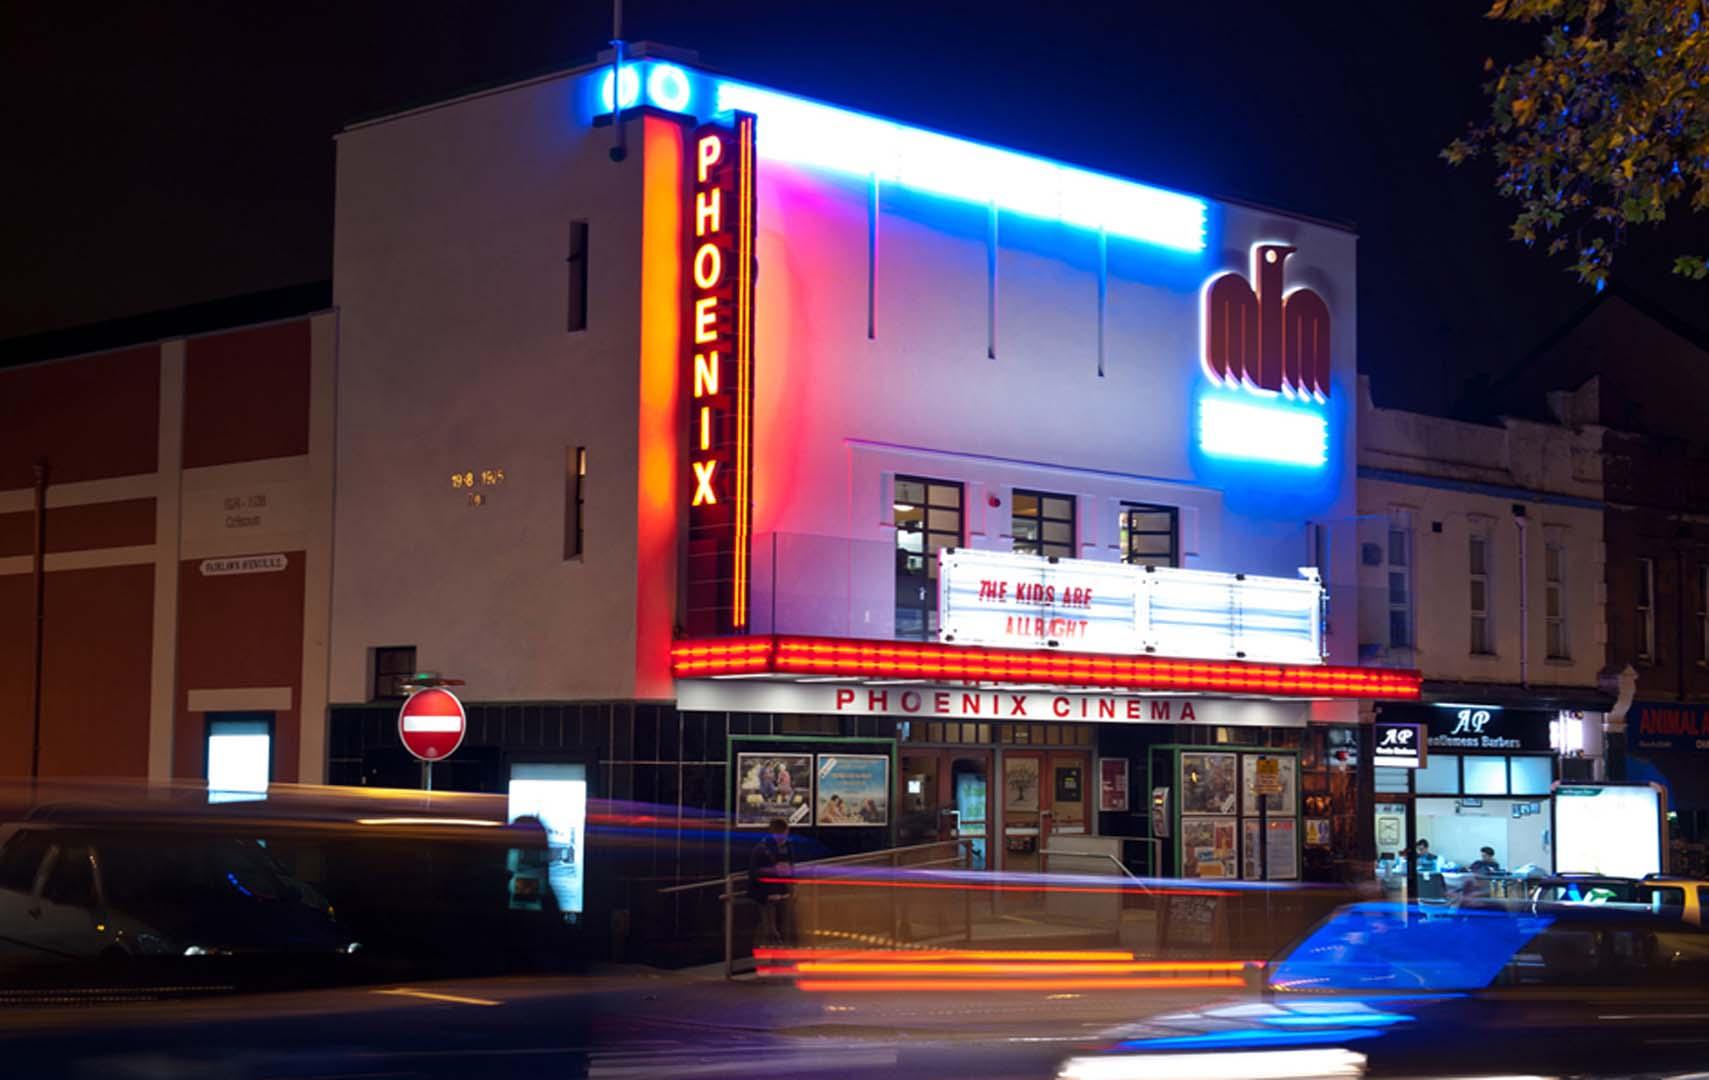 Phoenix Cinema, East Finchley